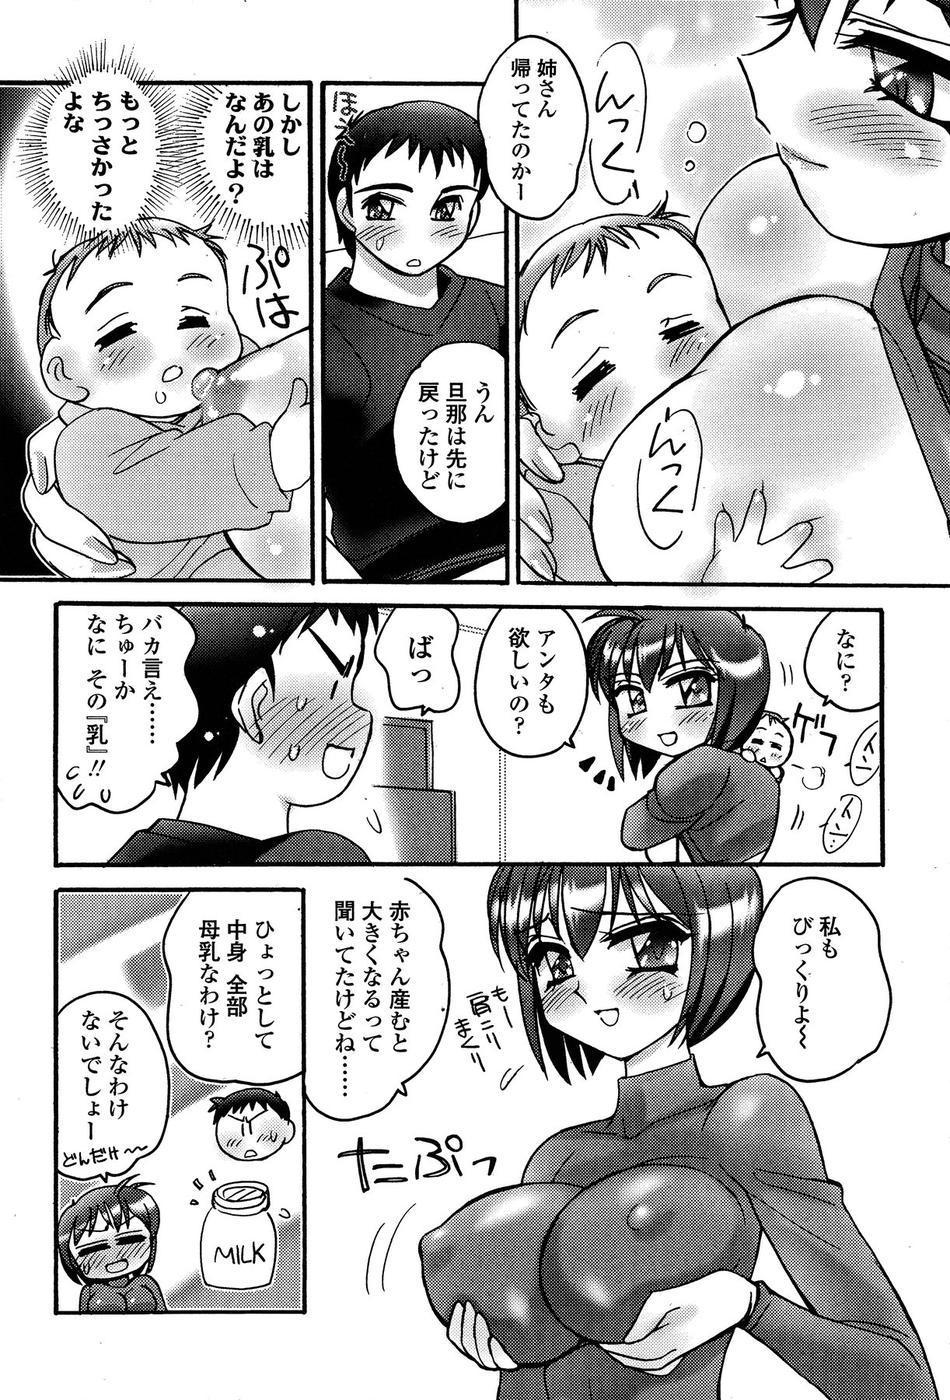 COMIC SIGMA 2009-01 Vol.28 128